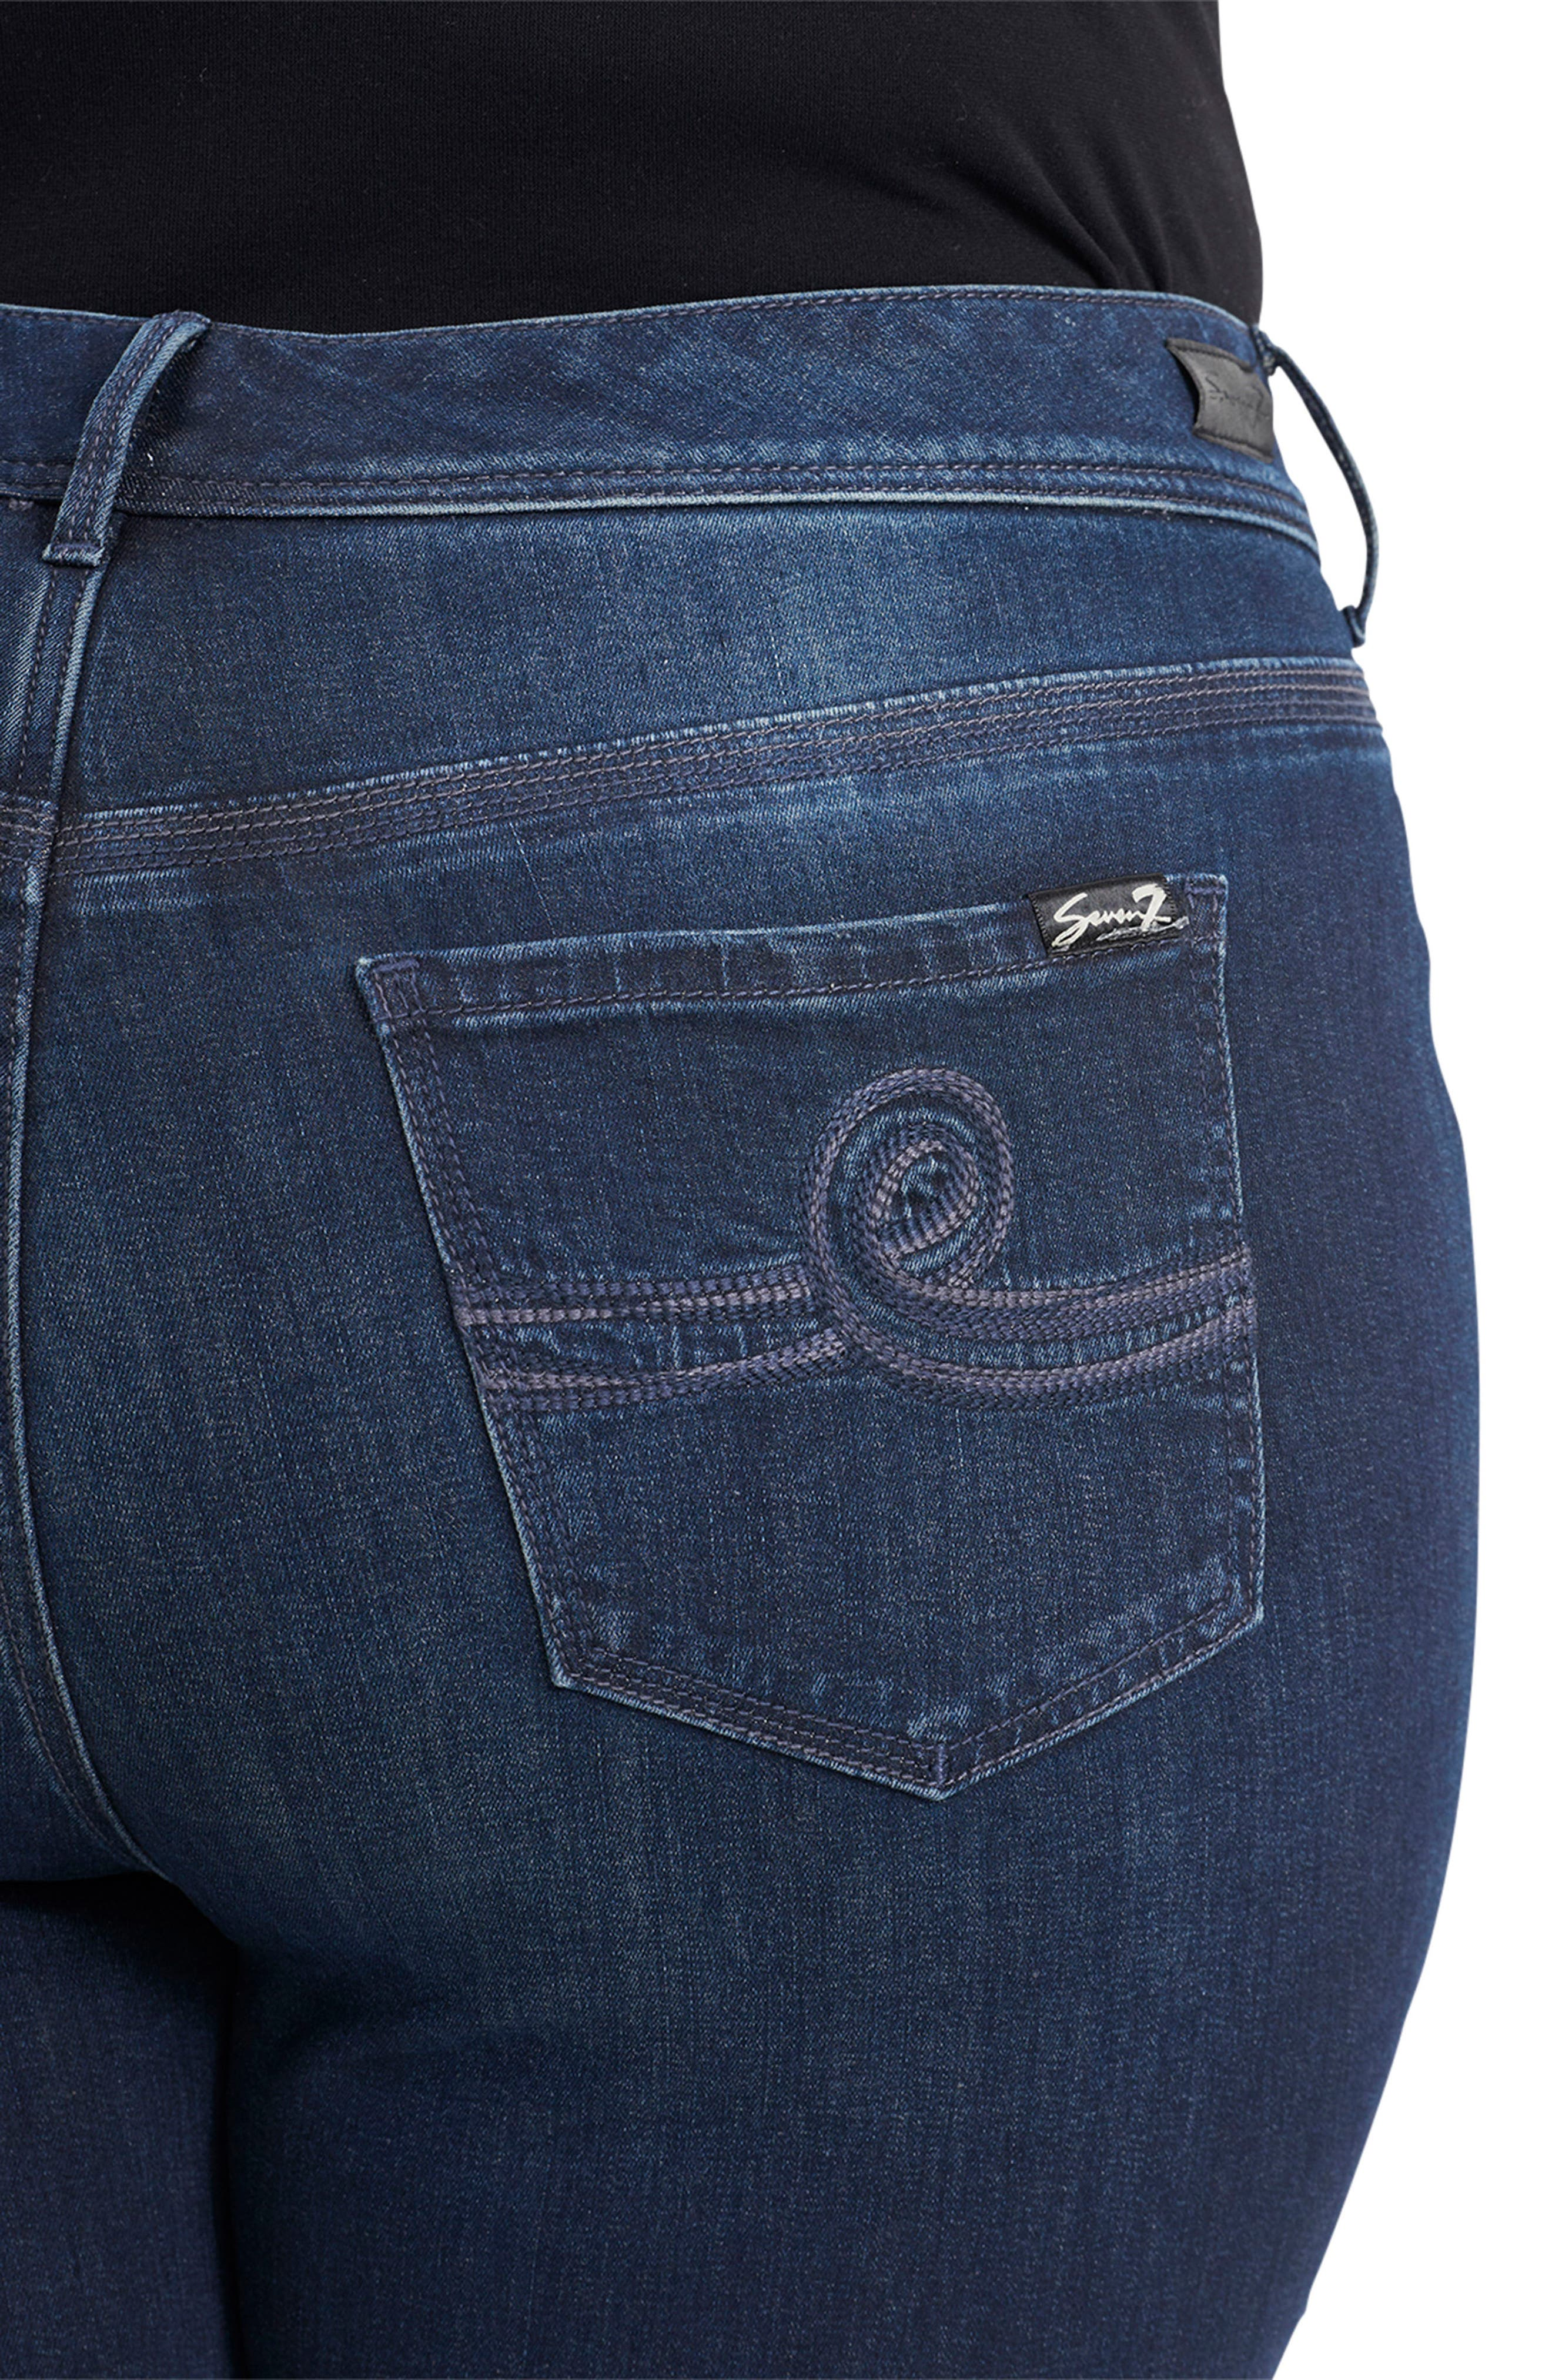 Tummyless High Rise Roll Cuff Slim Fit Jeans,                             Alternate thumbnail 4, color,                             TWAIN